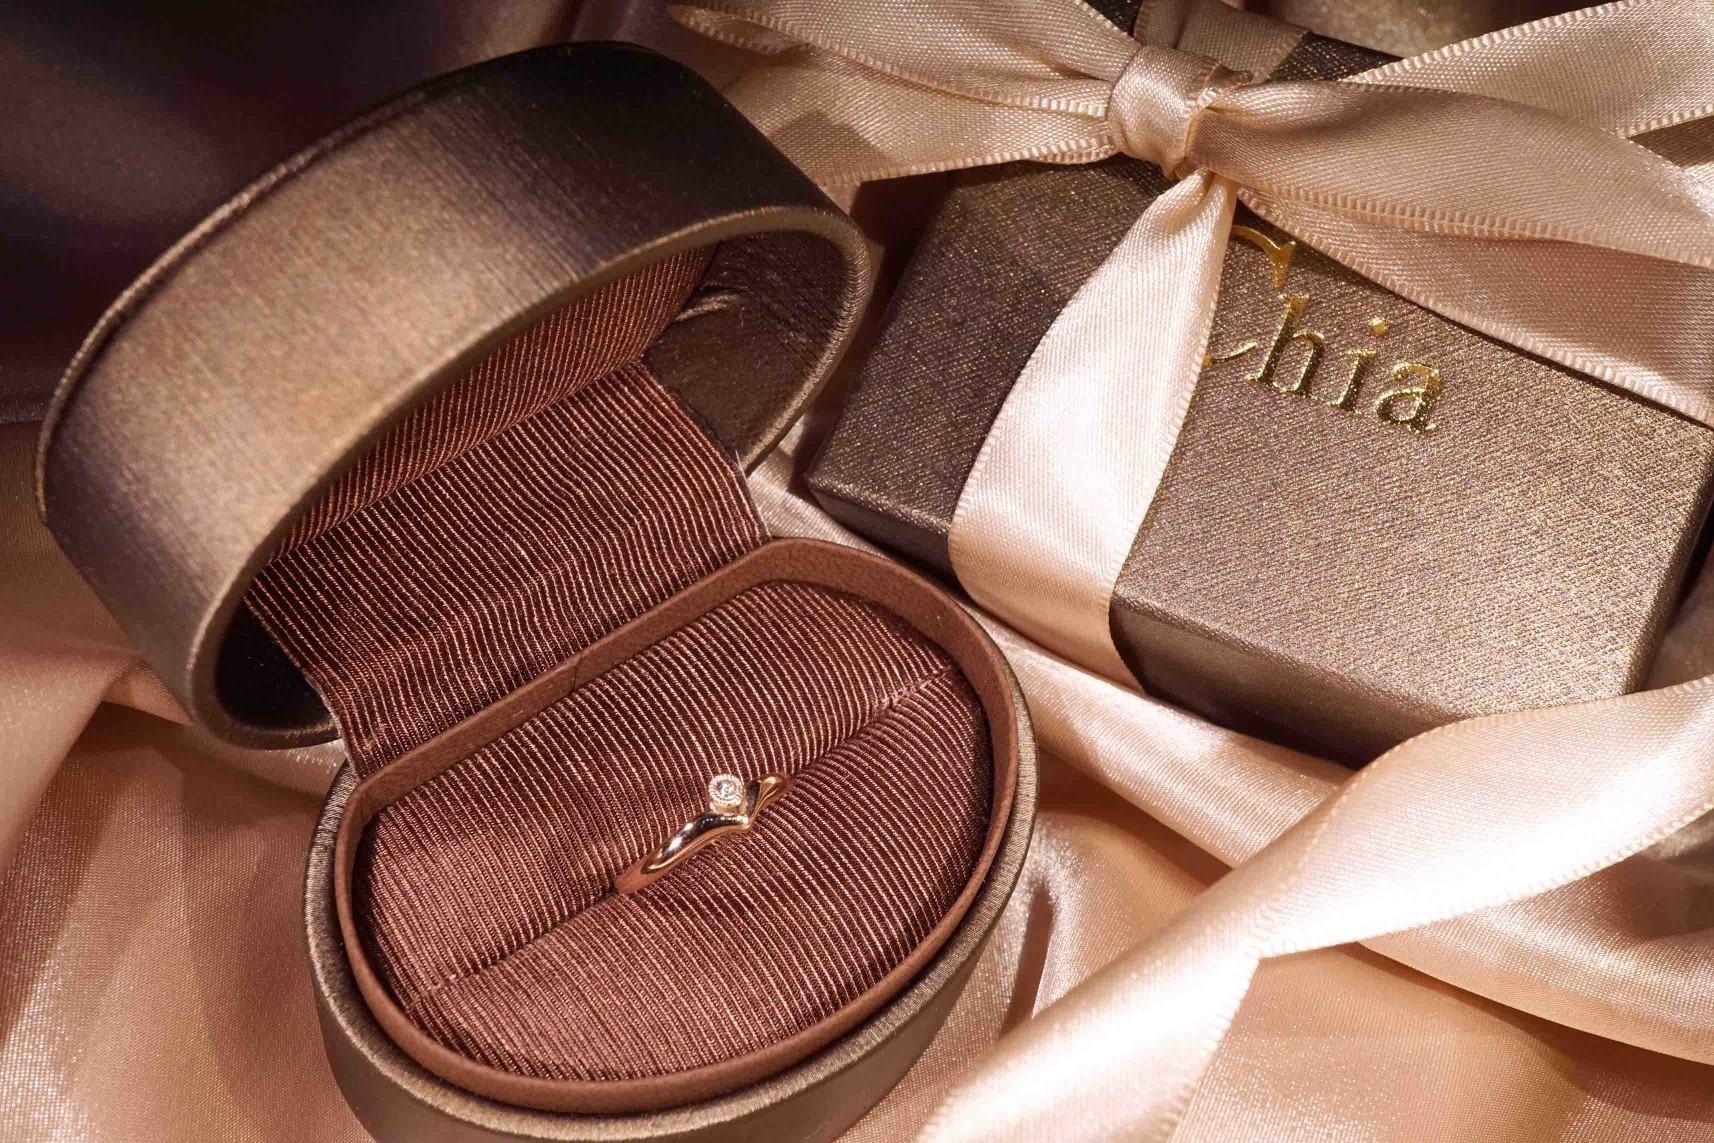 Chia Jewelry婚戒對戒|婚戒推薦|對戒推薦|鑽戒推薦|客製化婚戒推薦|客製化對戒推薦|客製化鑽戒推薦